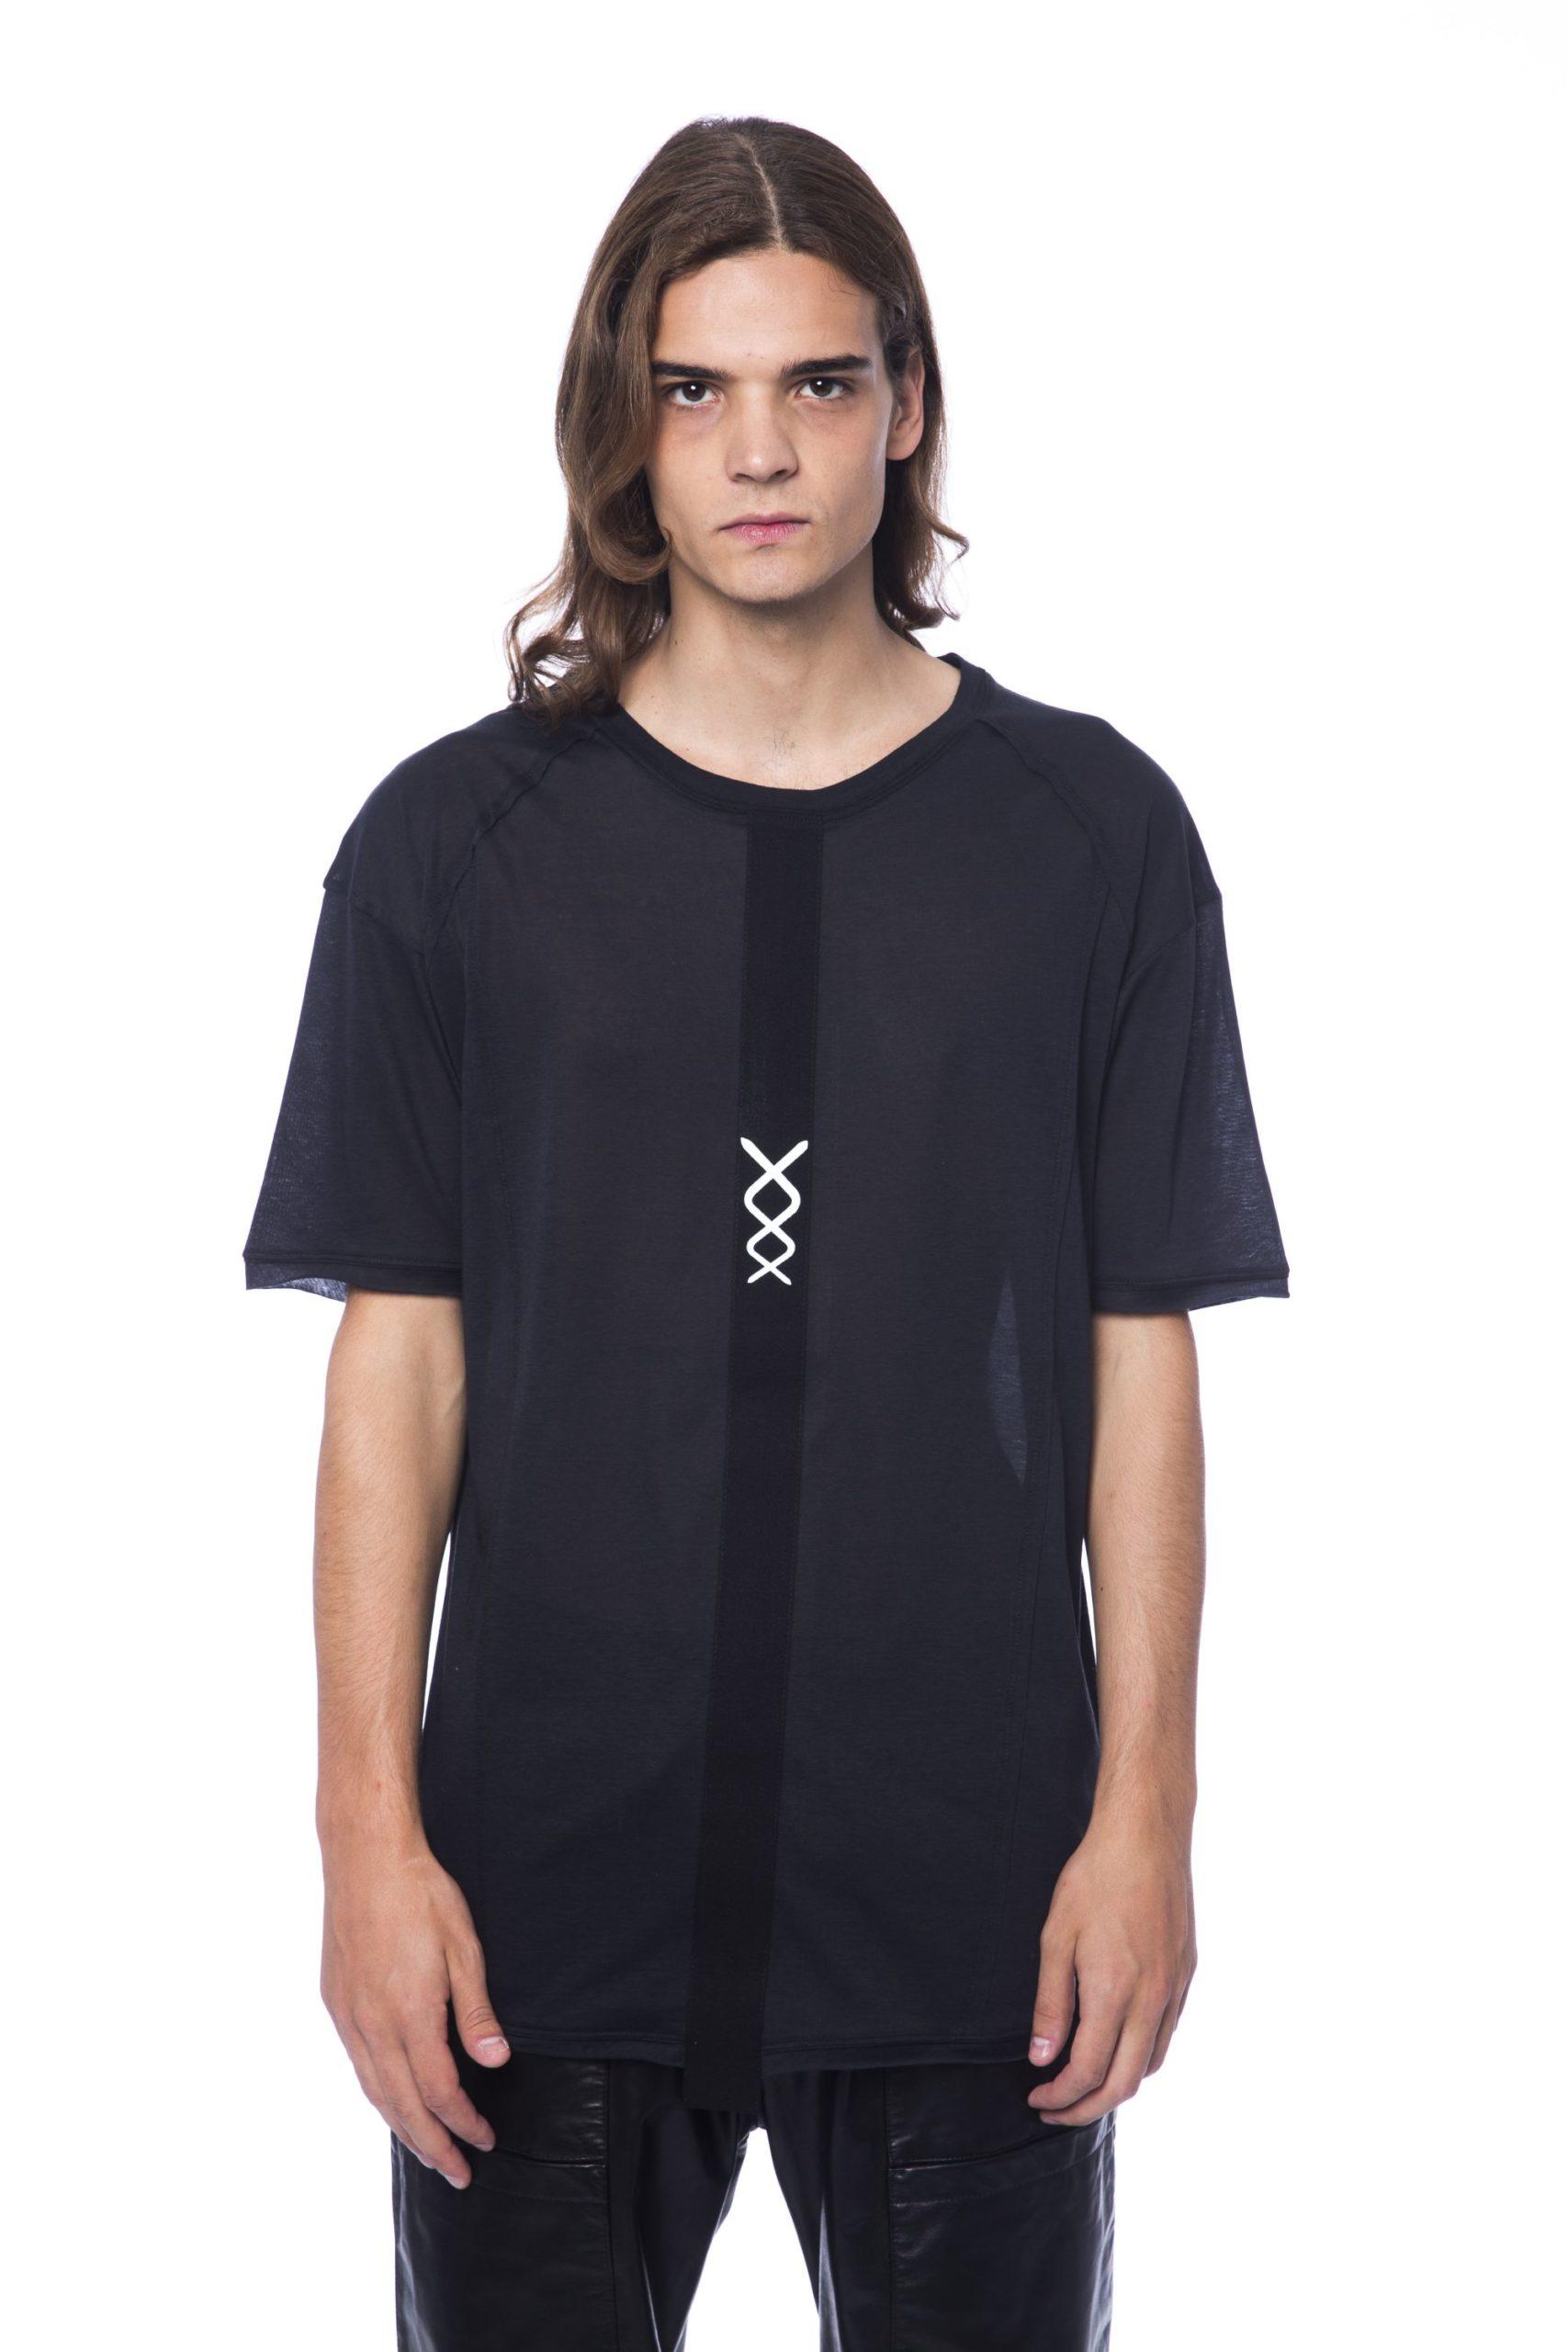 Nicolo Tonetto Men's Nero T-Shirt Black NI678721 - XL